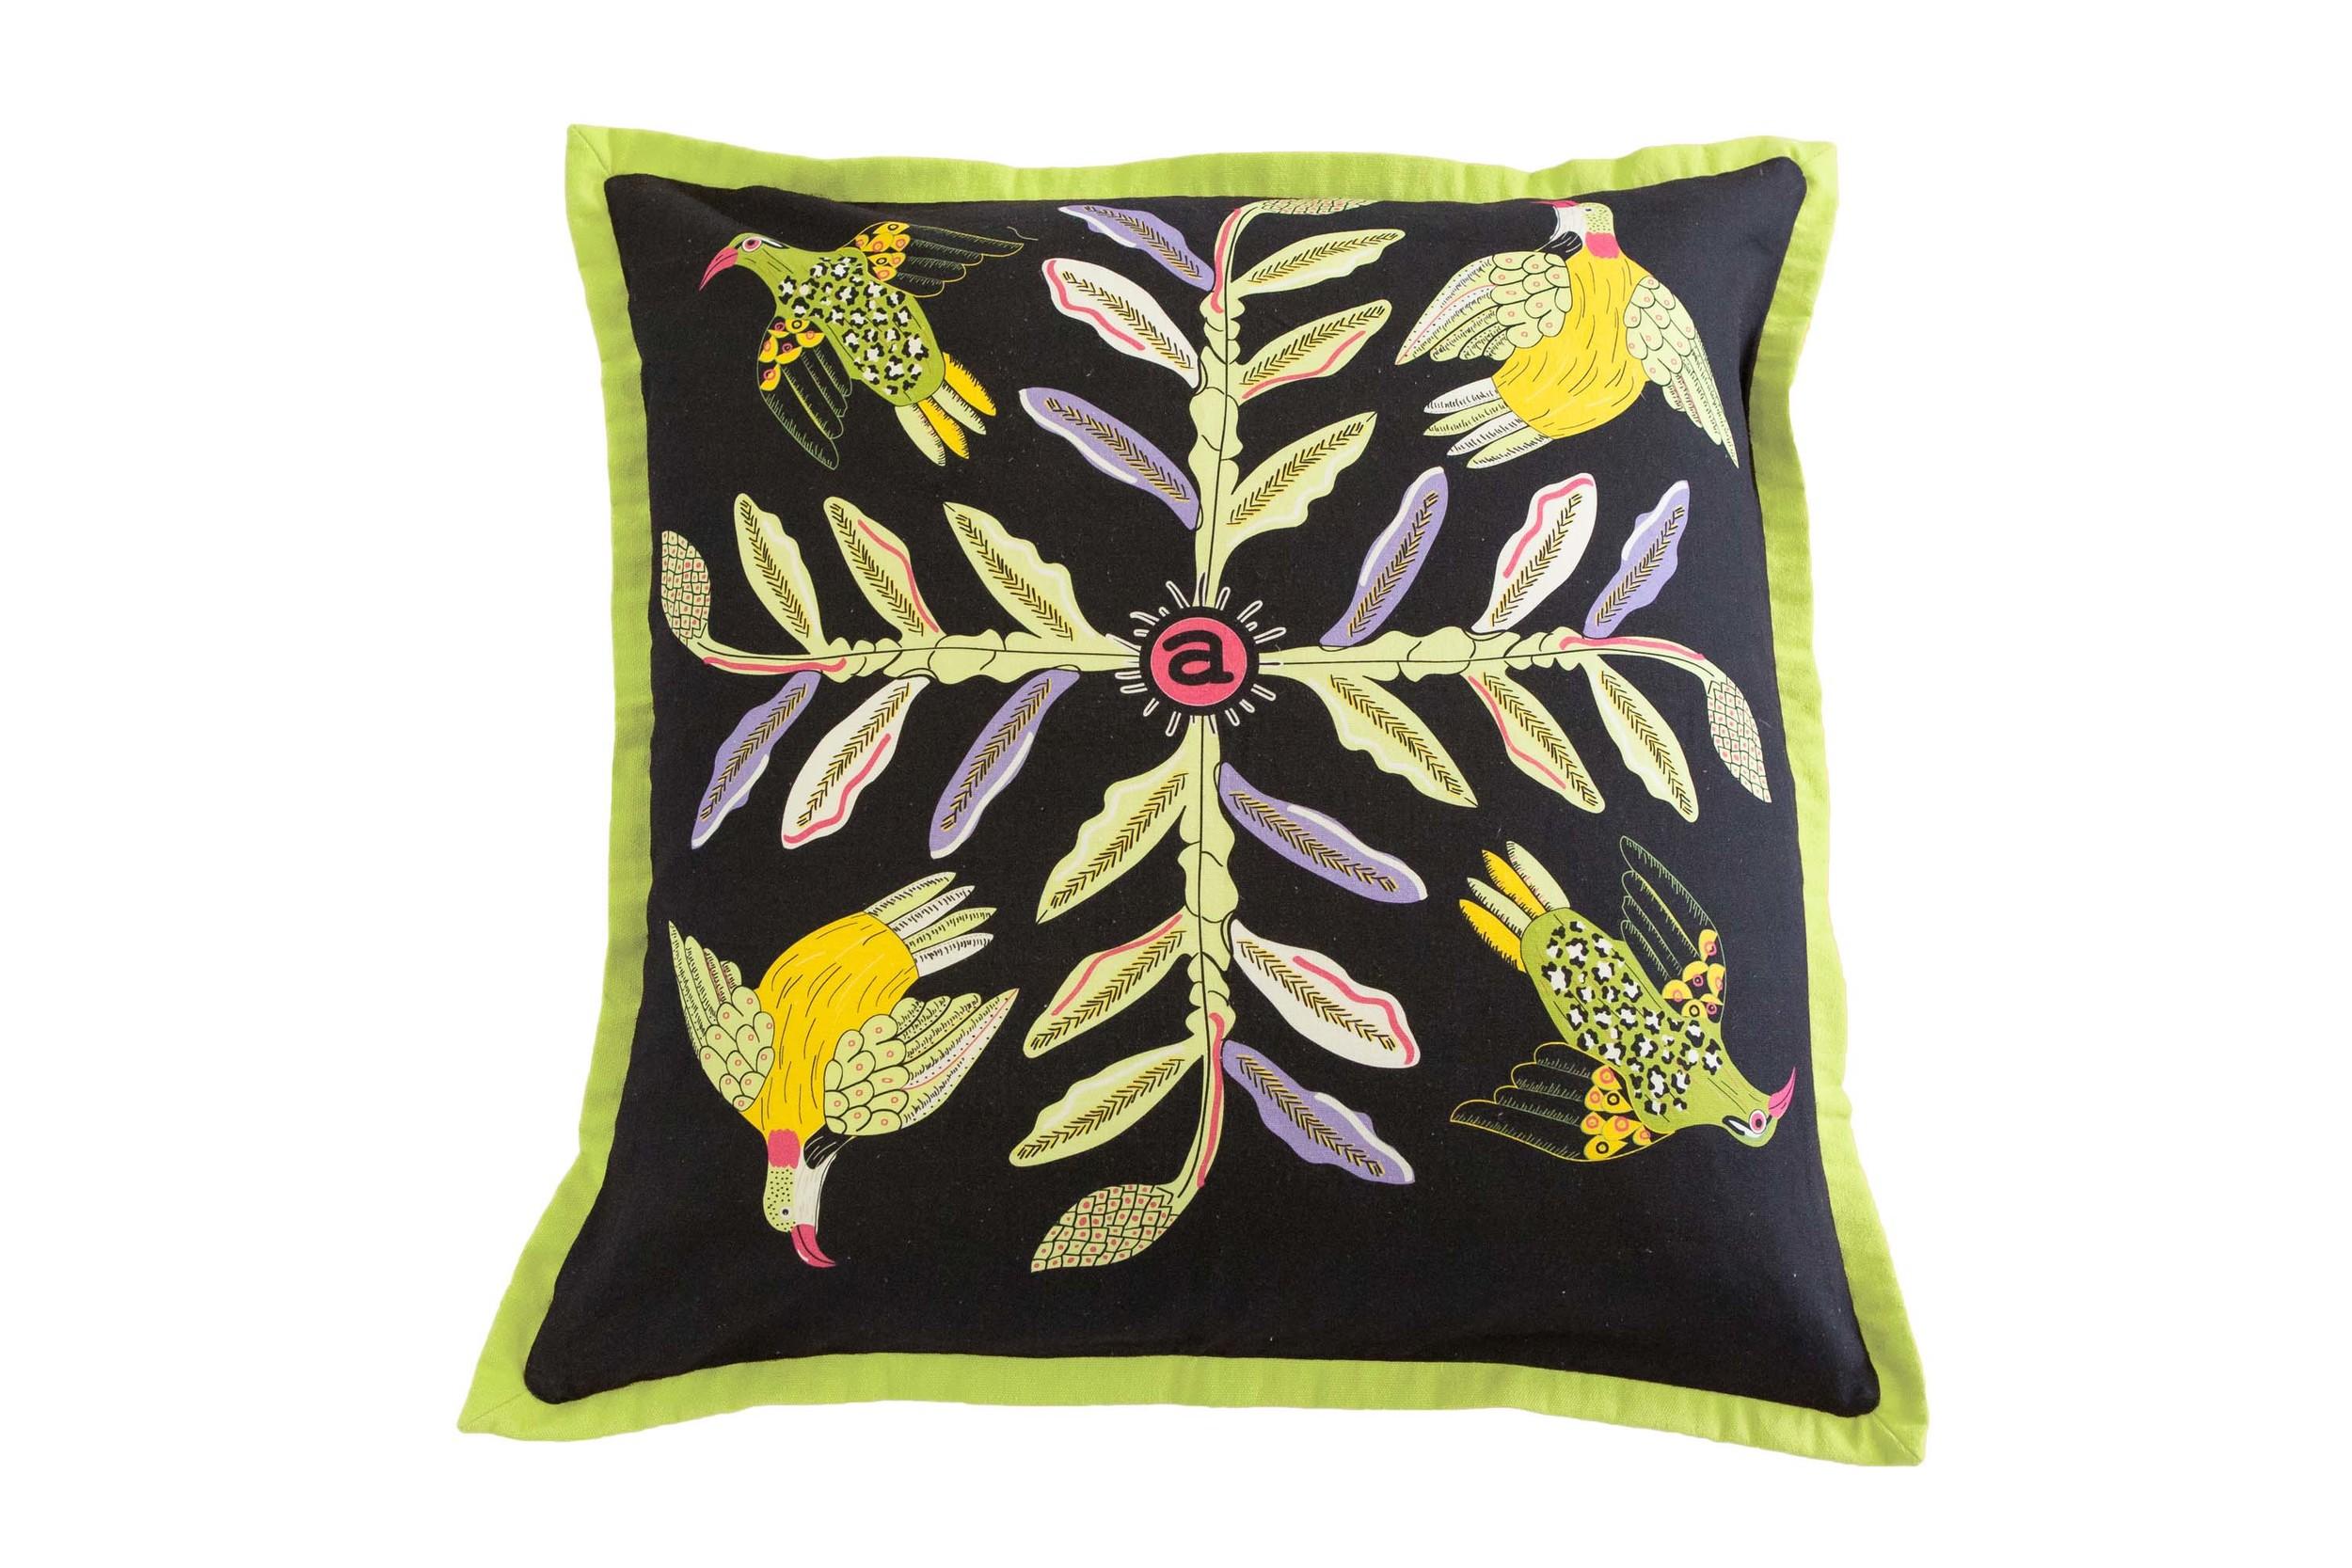 Halsted Bird Crossing cushion